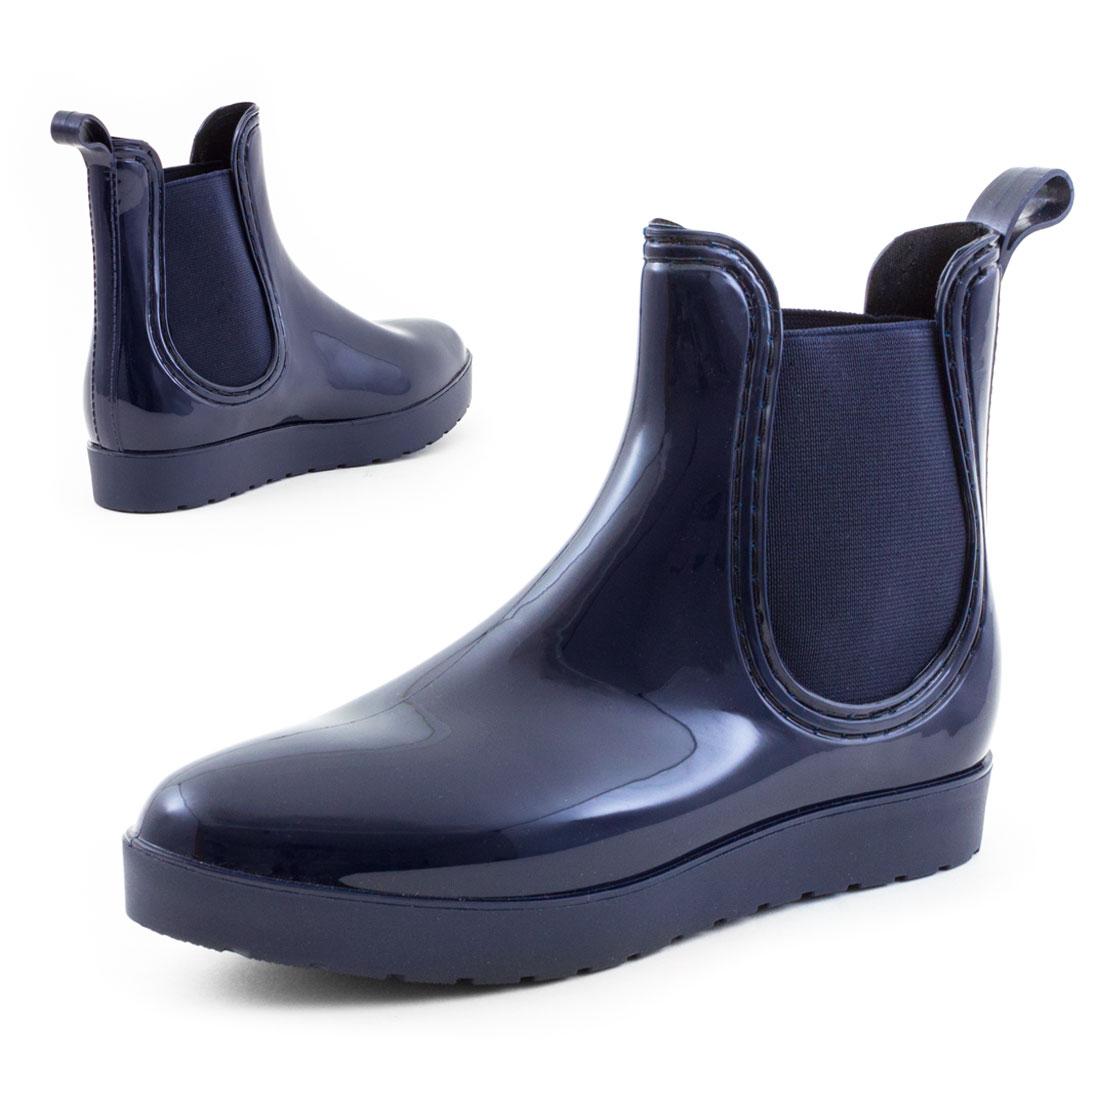 neu damen chelsea lack boots plateau gummistiefel herbst gr 36 37 38 39 40 41 ebay. Black Bedroom Furniture Sets. Home Design Ideas